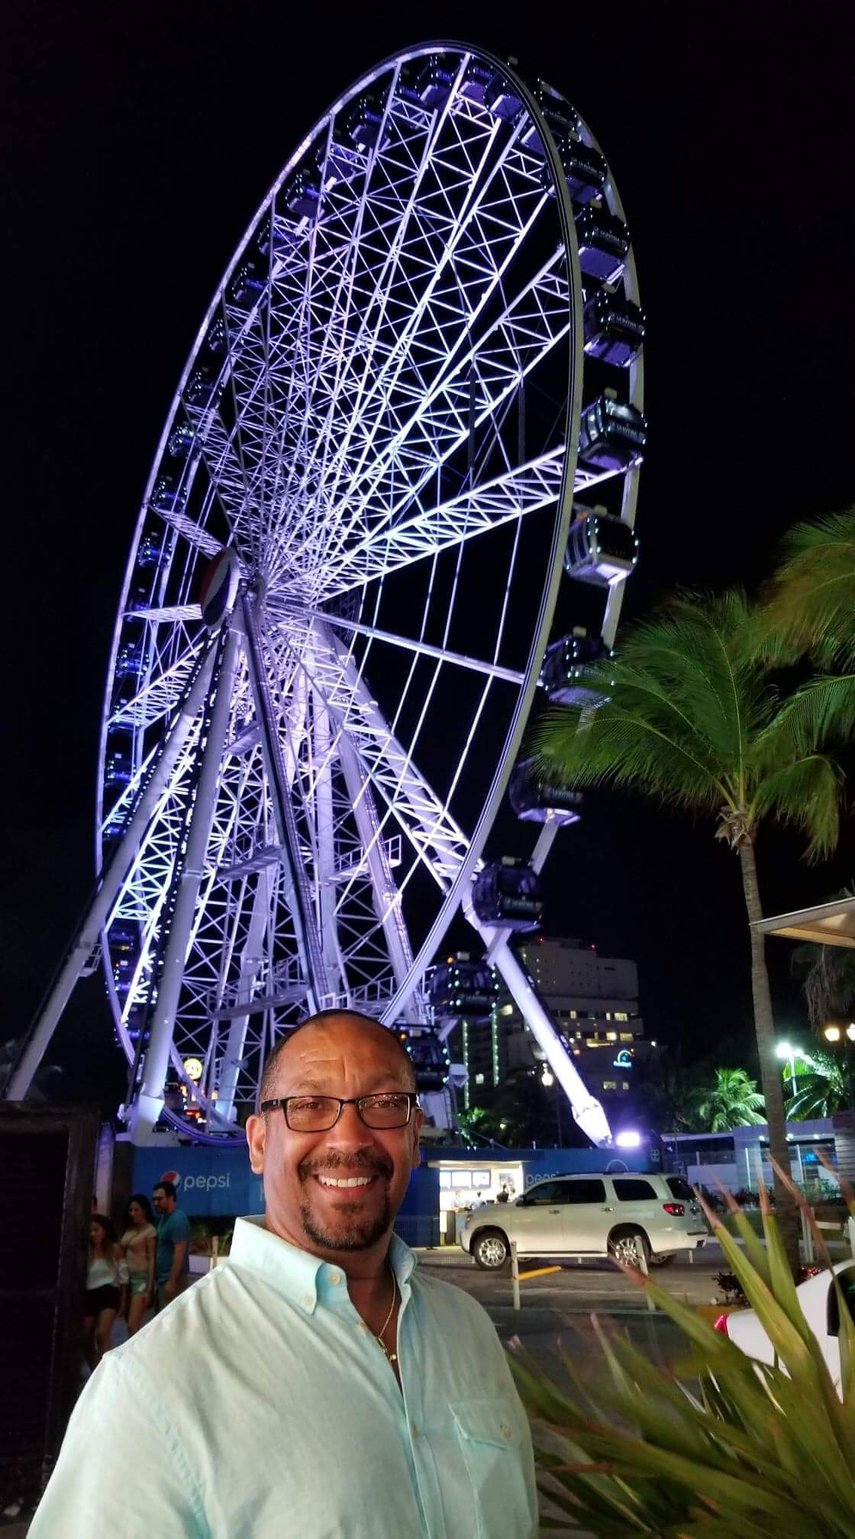 This beautiful ferris wheel is in Cancun, just steps away from the Lagunamar Resort.#VacationLife via @Vistana